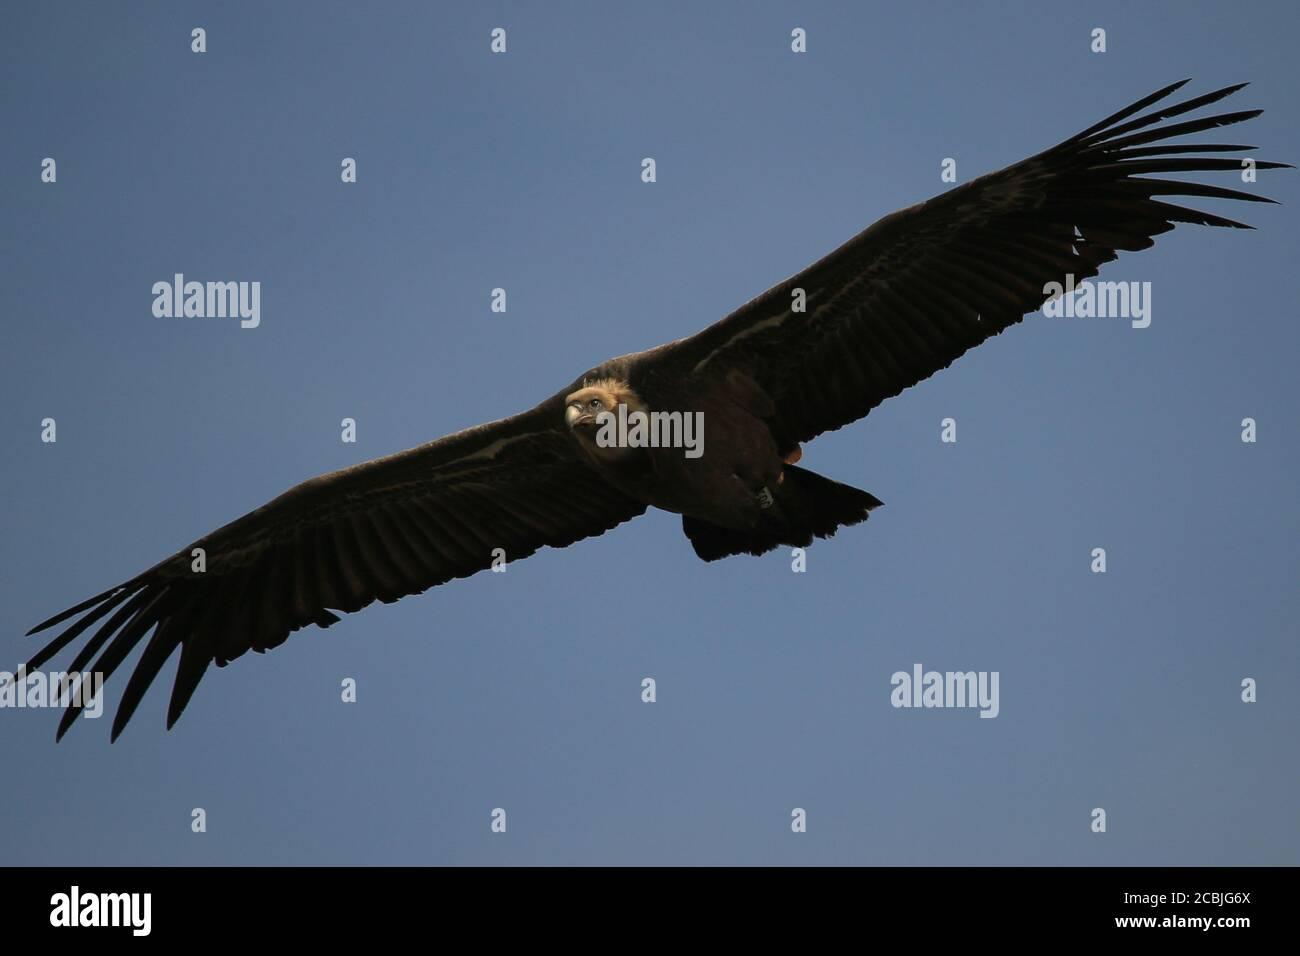 Griffon Vulture volare nelle Gorges du Verdon, Provenza, Francia. Foto Stock